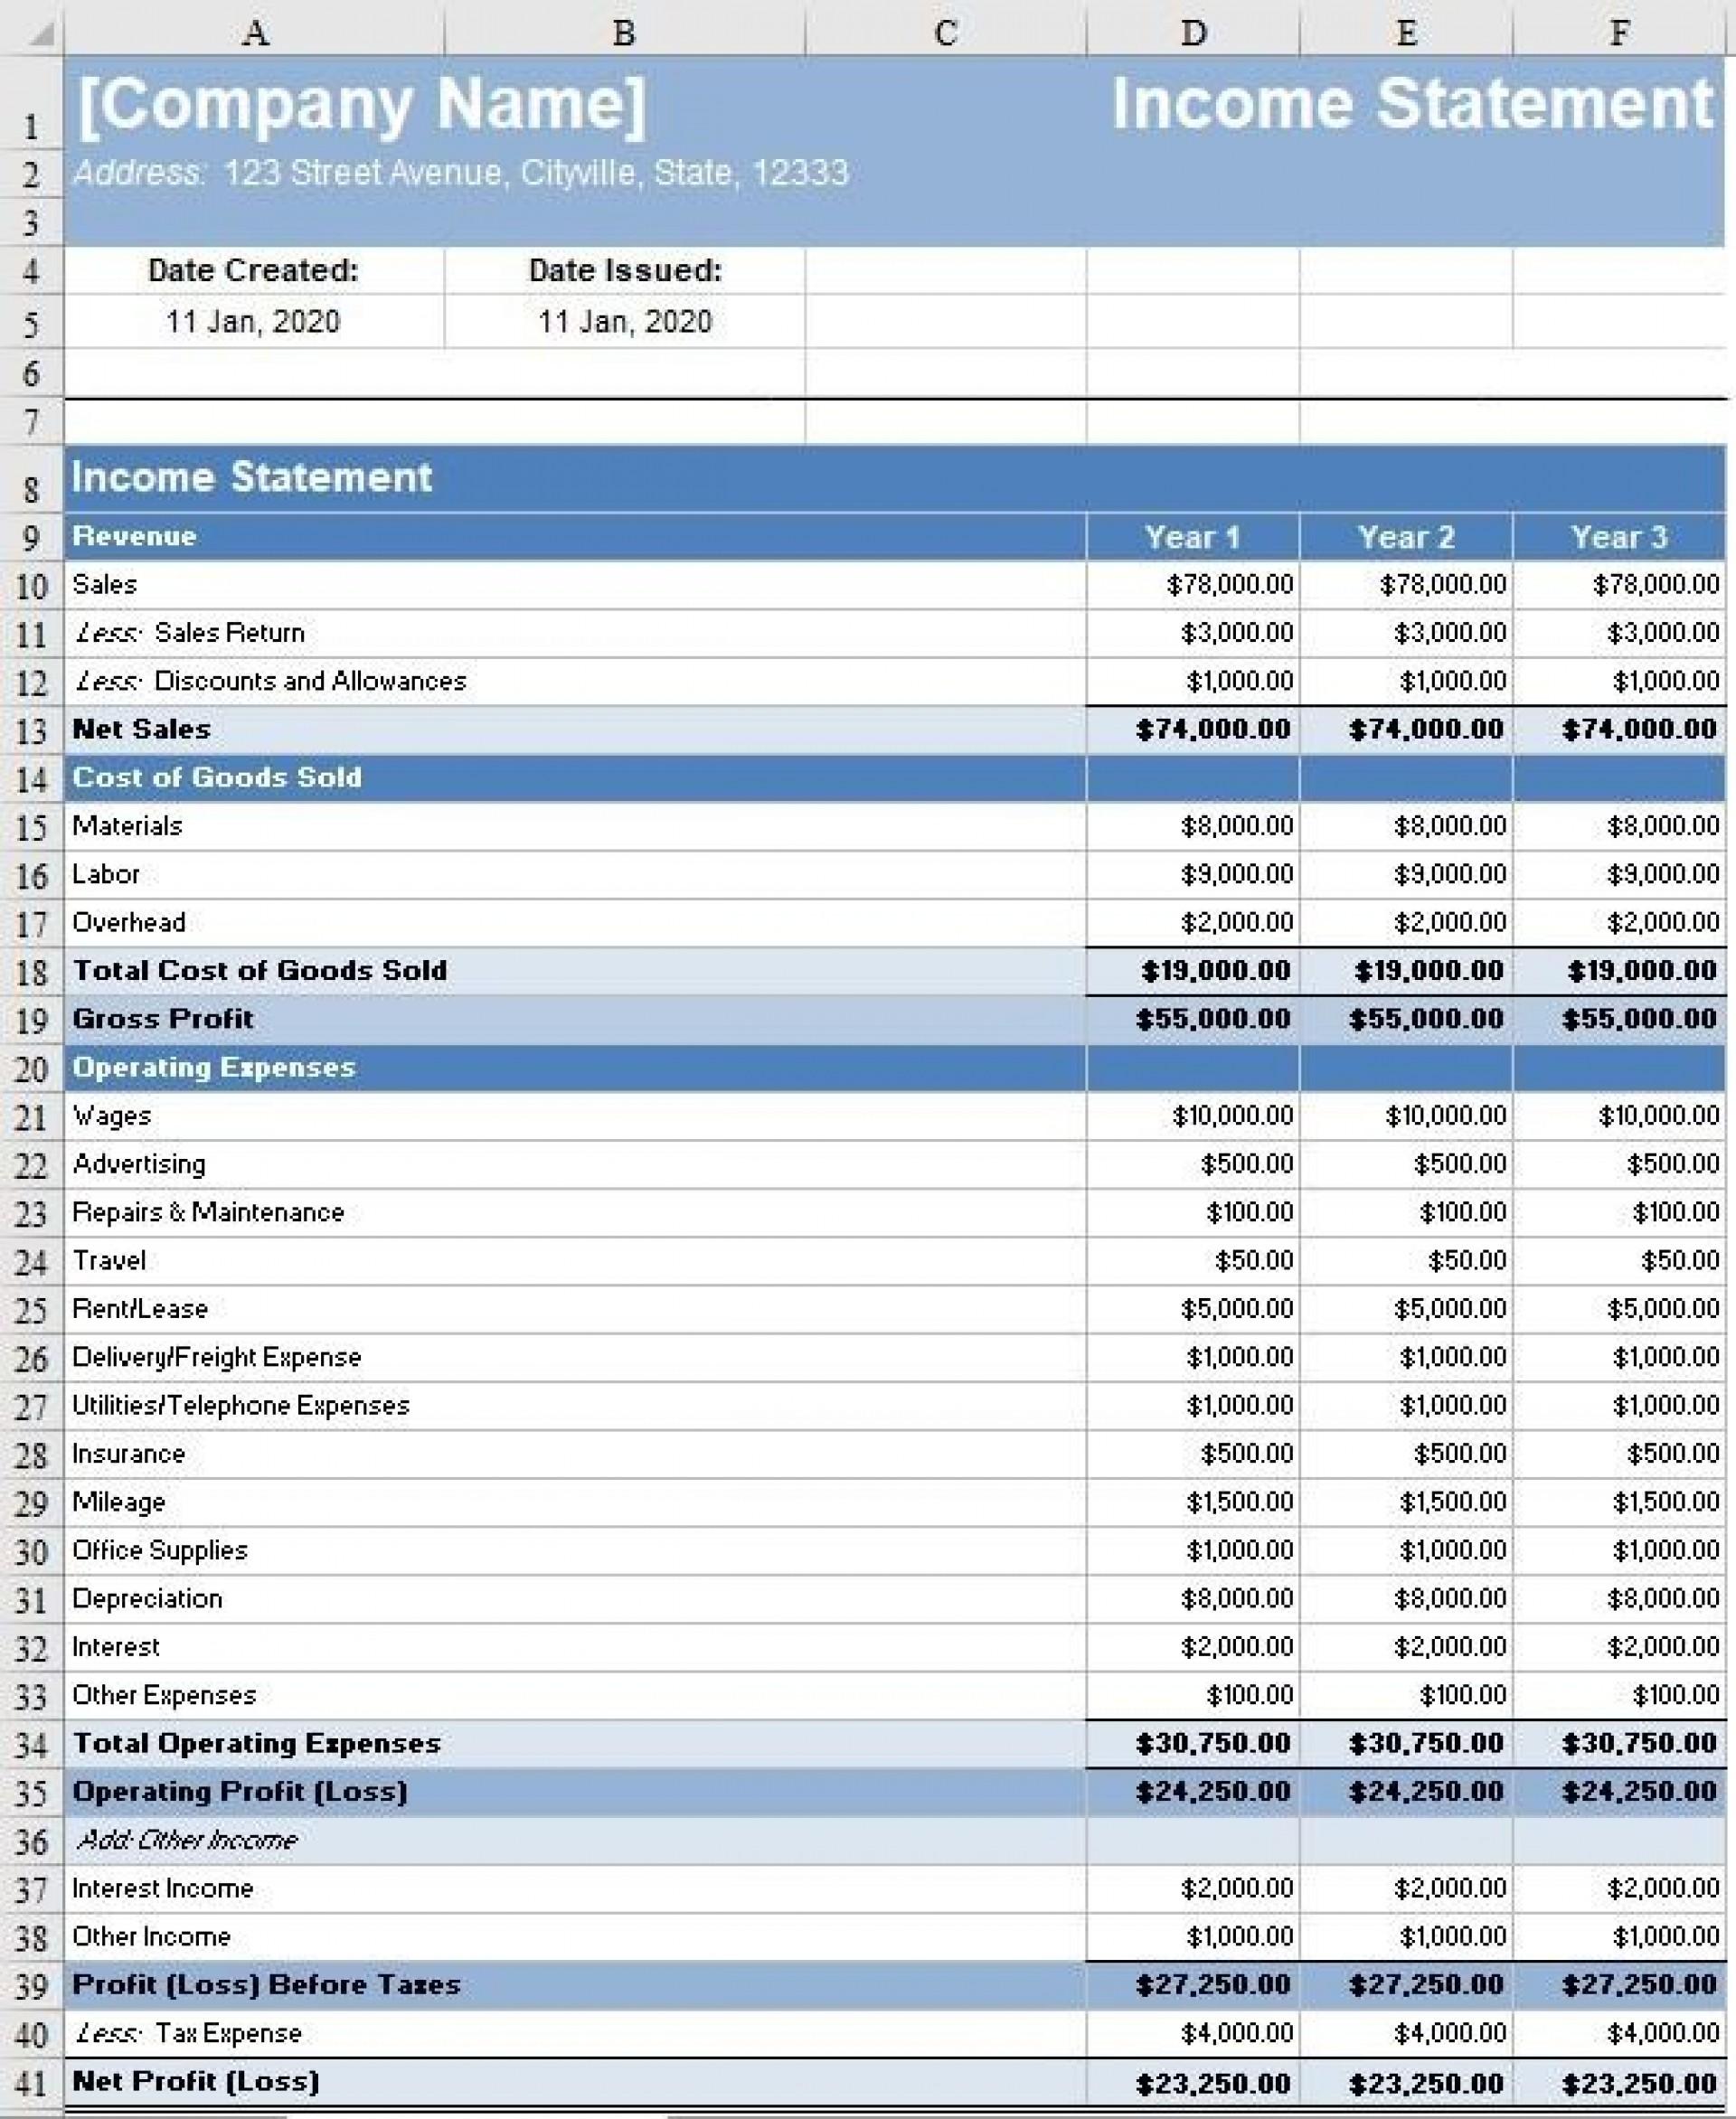 008 Sensational Monthly Income Statement Format Excel Free Download Design 1920